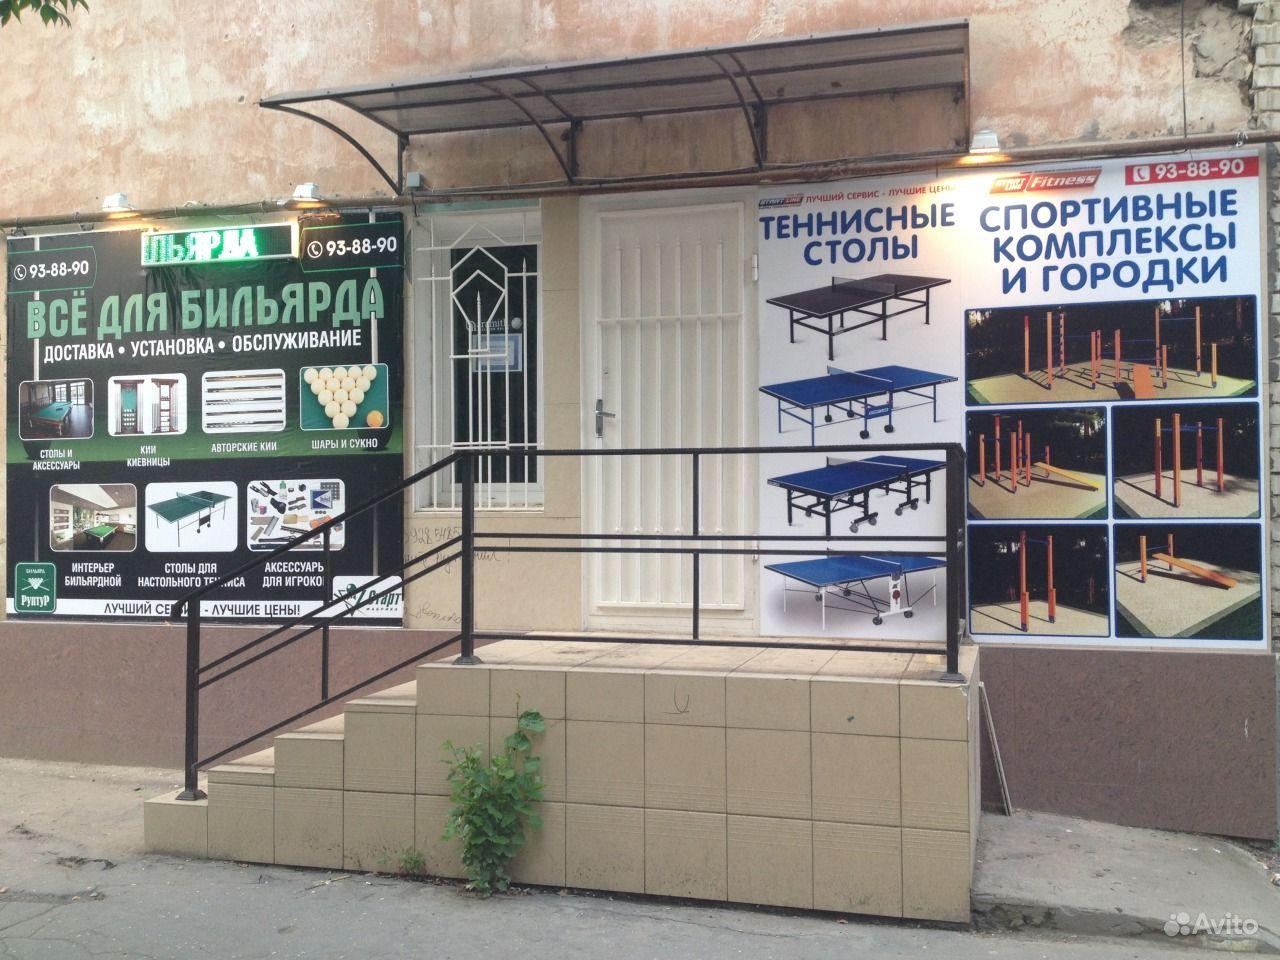 Сайты знакомств узбекистан 5 фотография